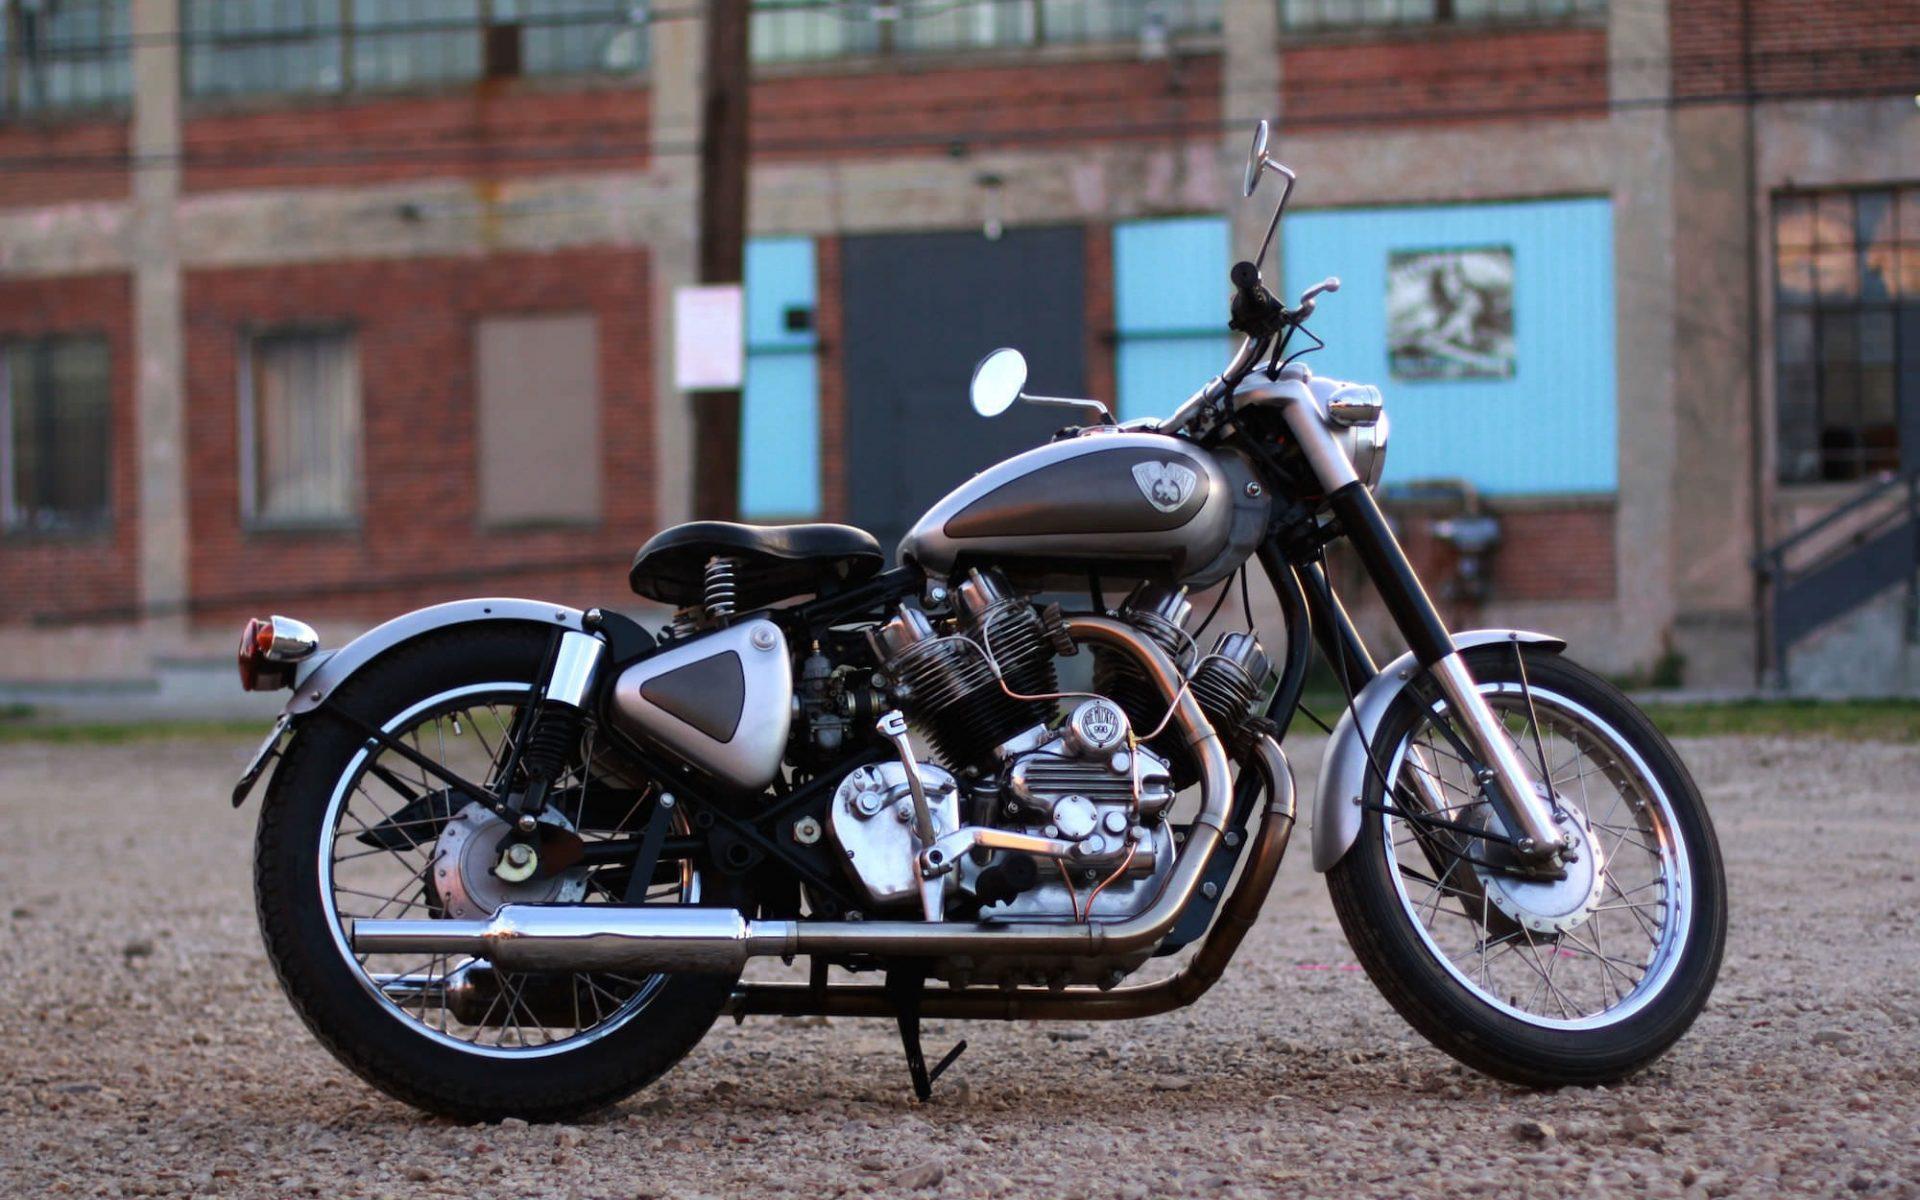 Royal Enfield Bullet Bike Photo X on V Twin Engine Animation